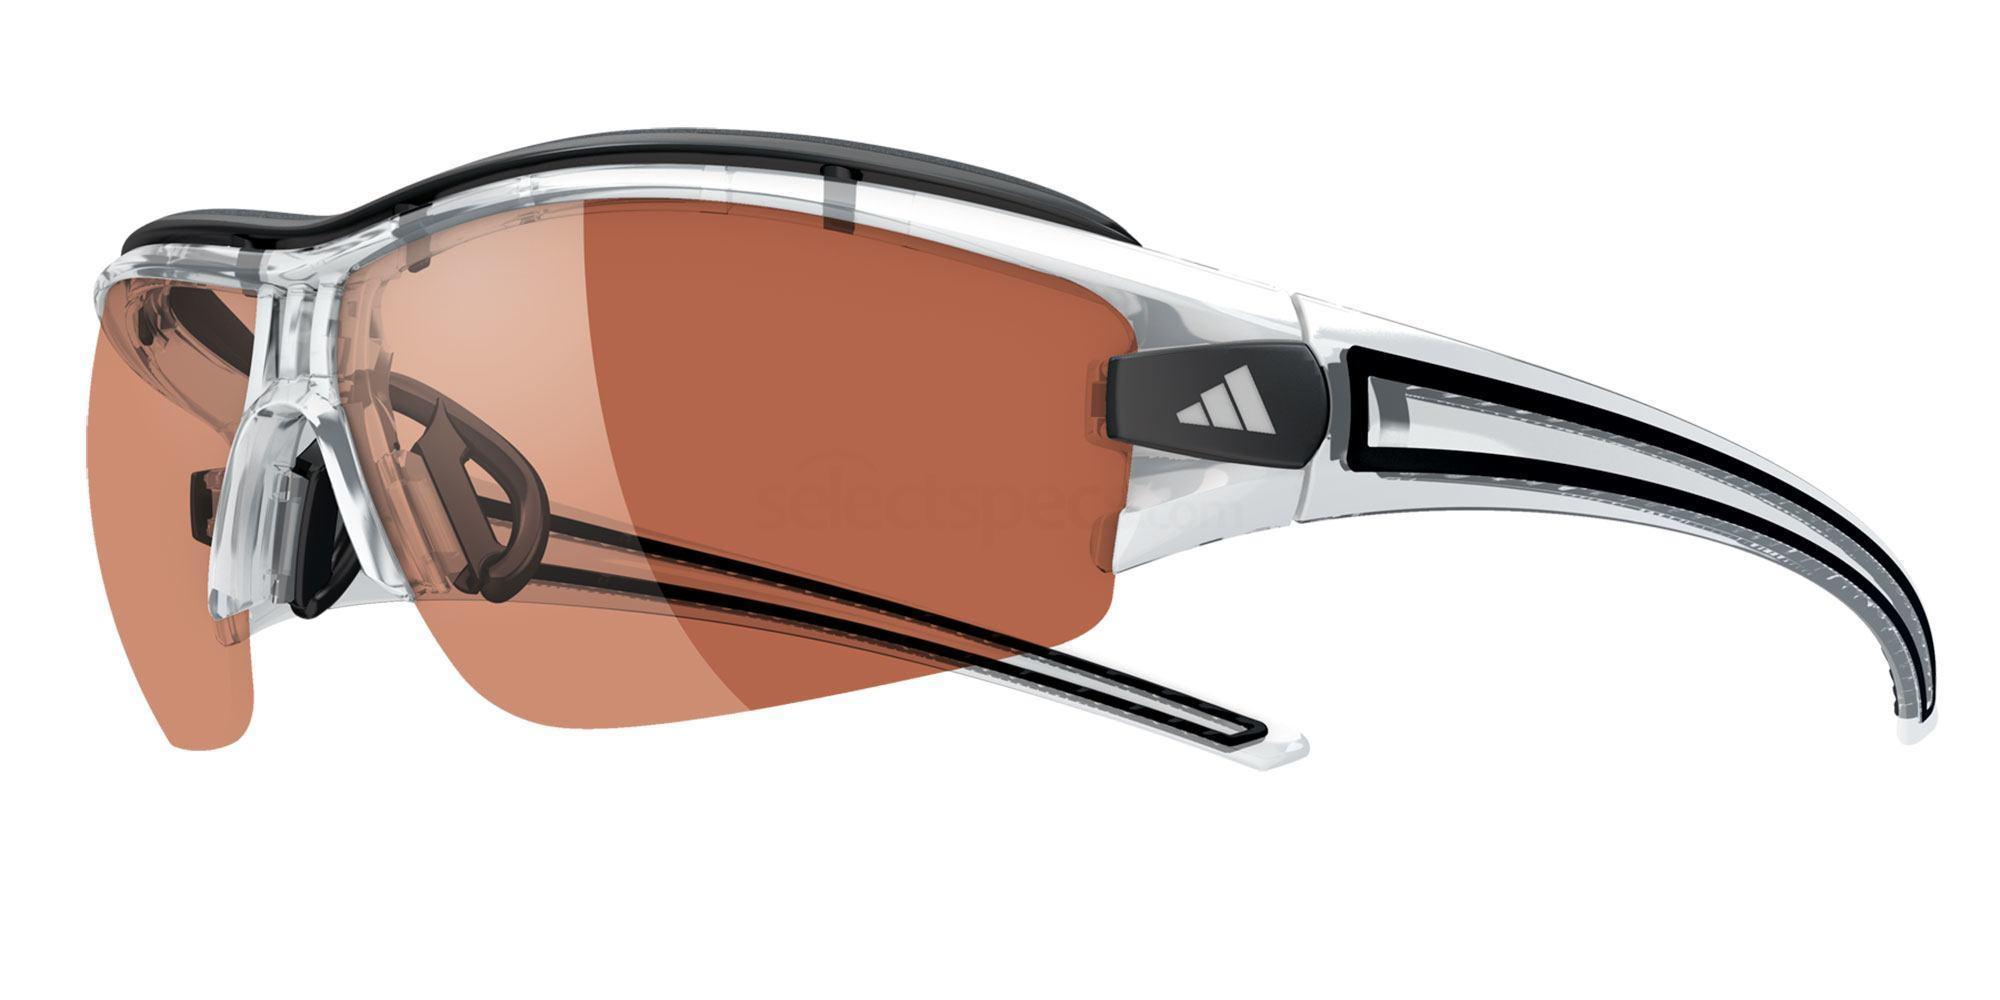 a180/00 6078 a180 Evil Eye Halfrim Pro XS (2/2) Sunglasses, Adidas